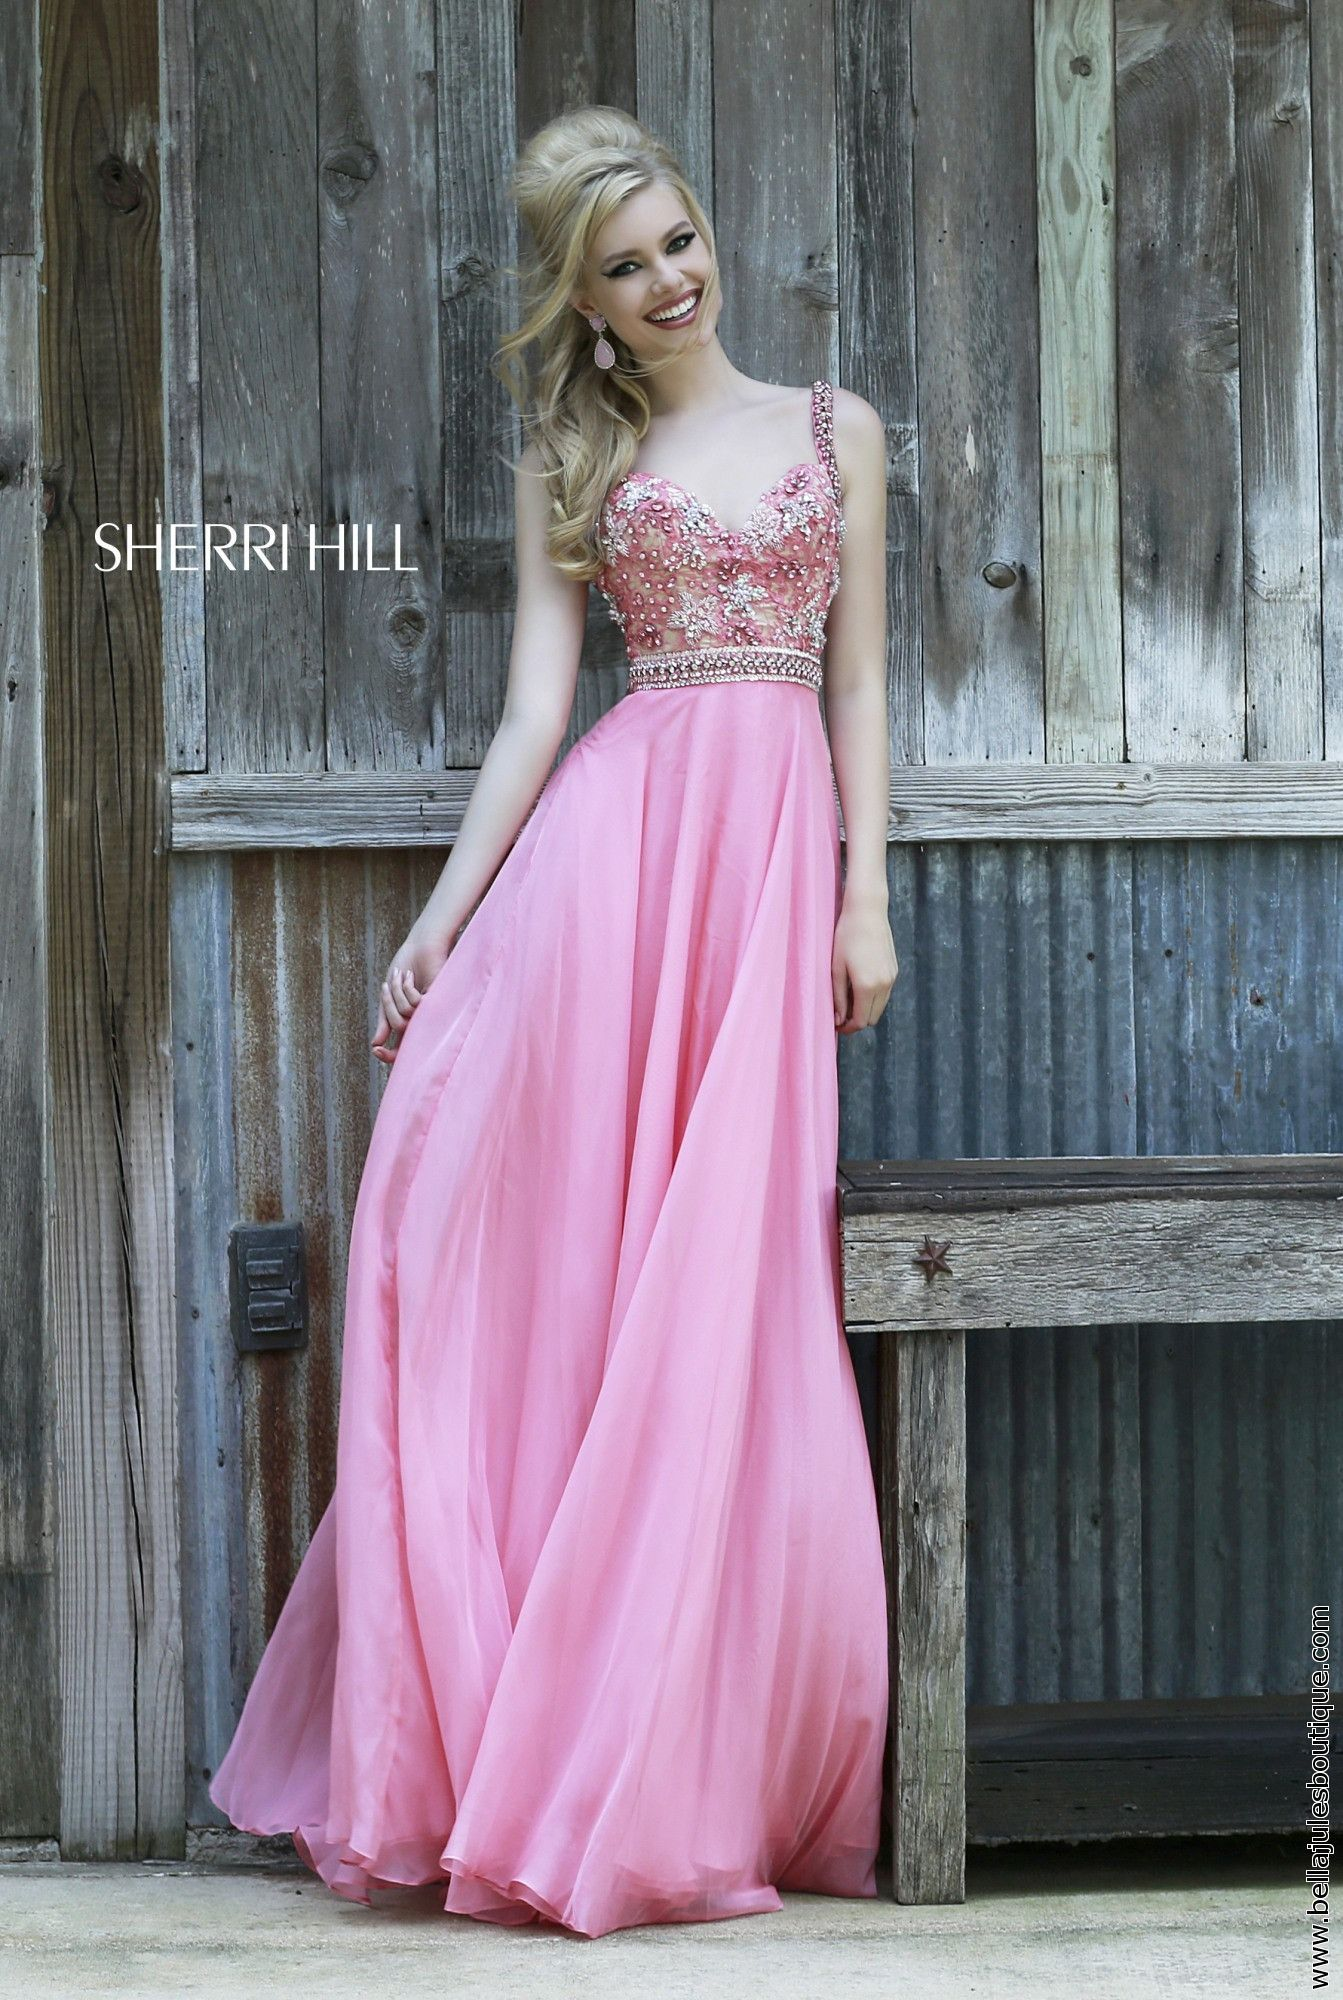 Sherri Hill dress style 8552 – Bella Jules Fashion Boutique | Moda ...